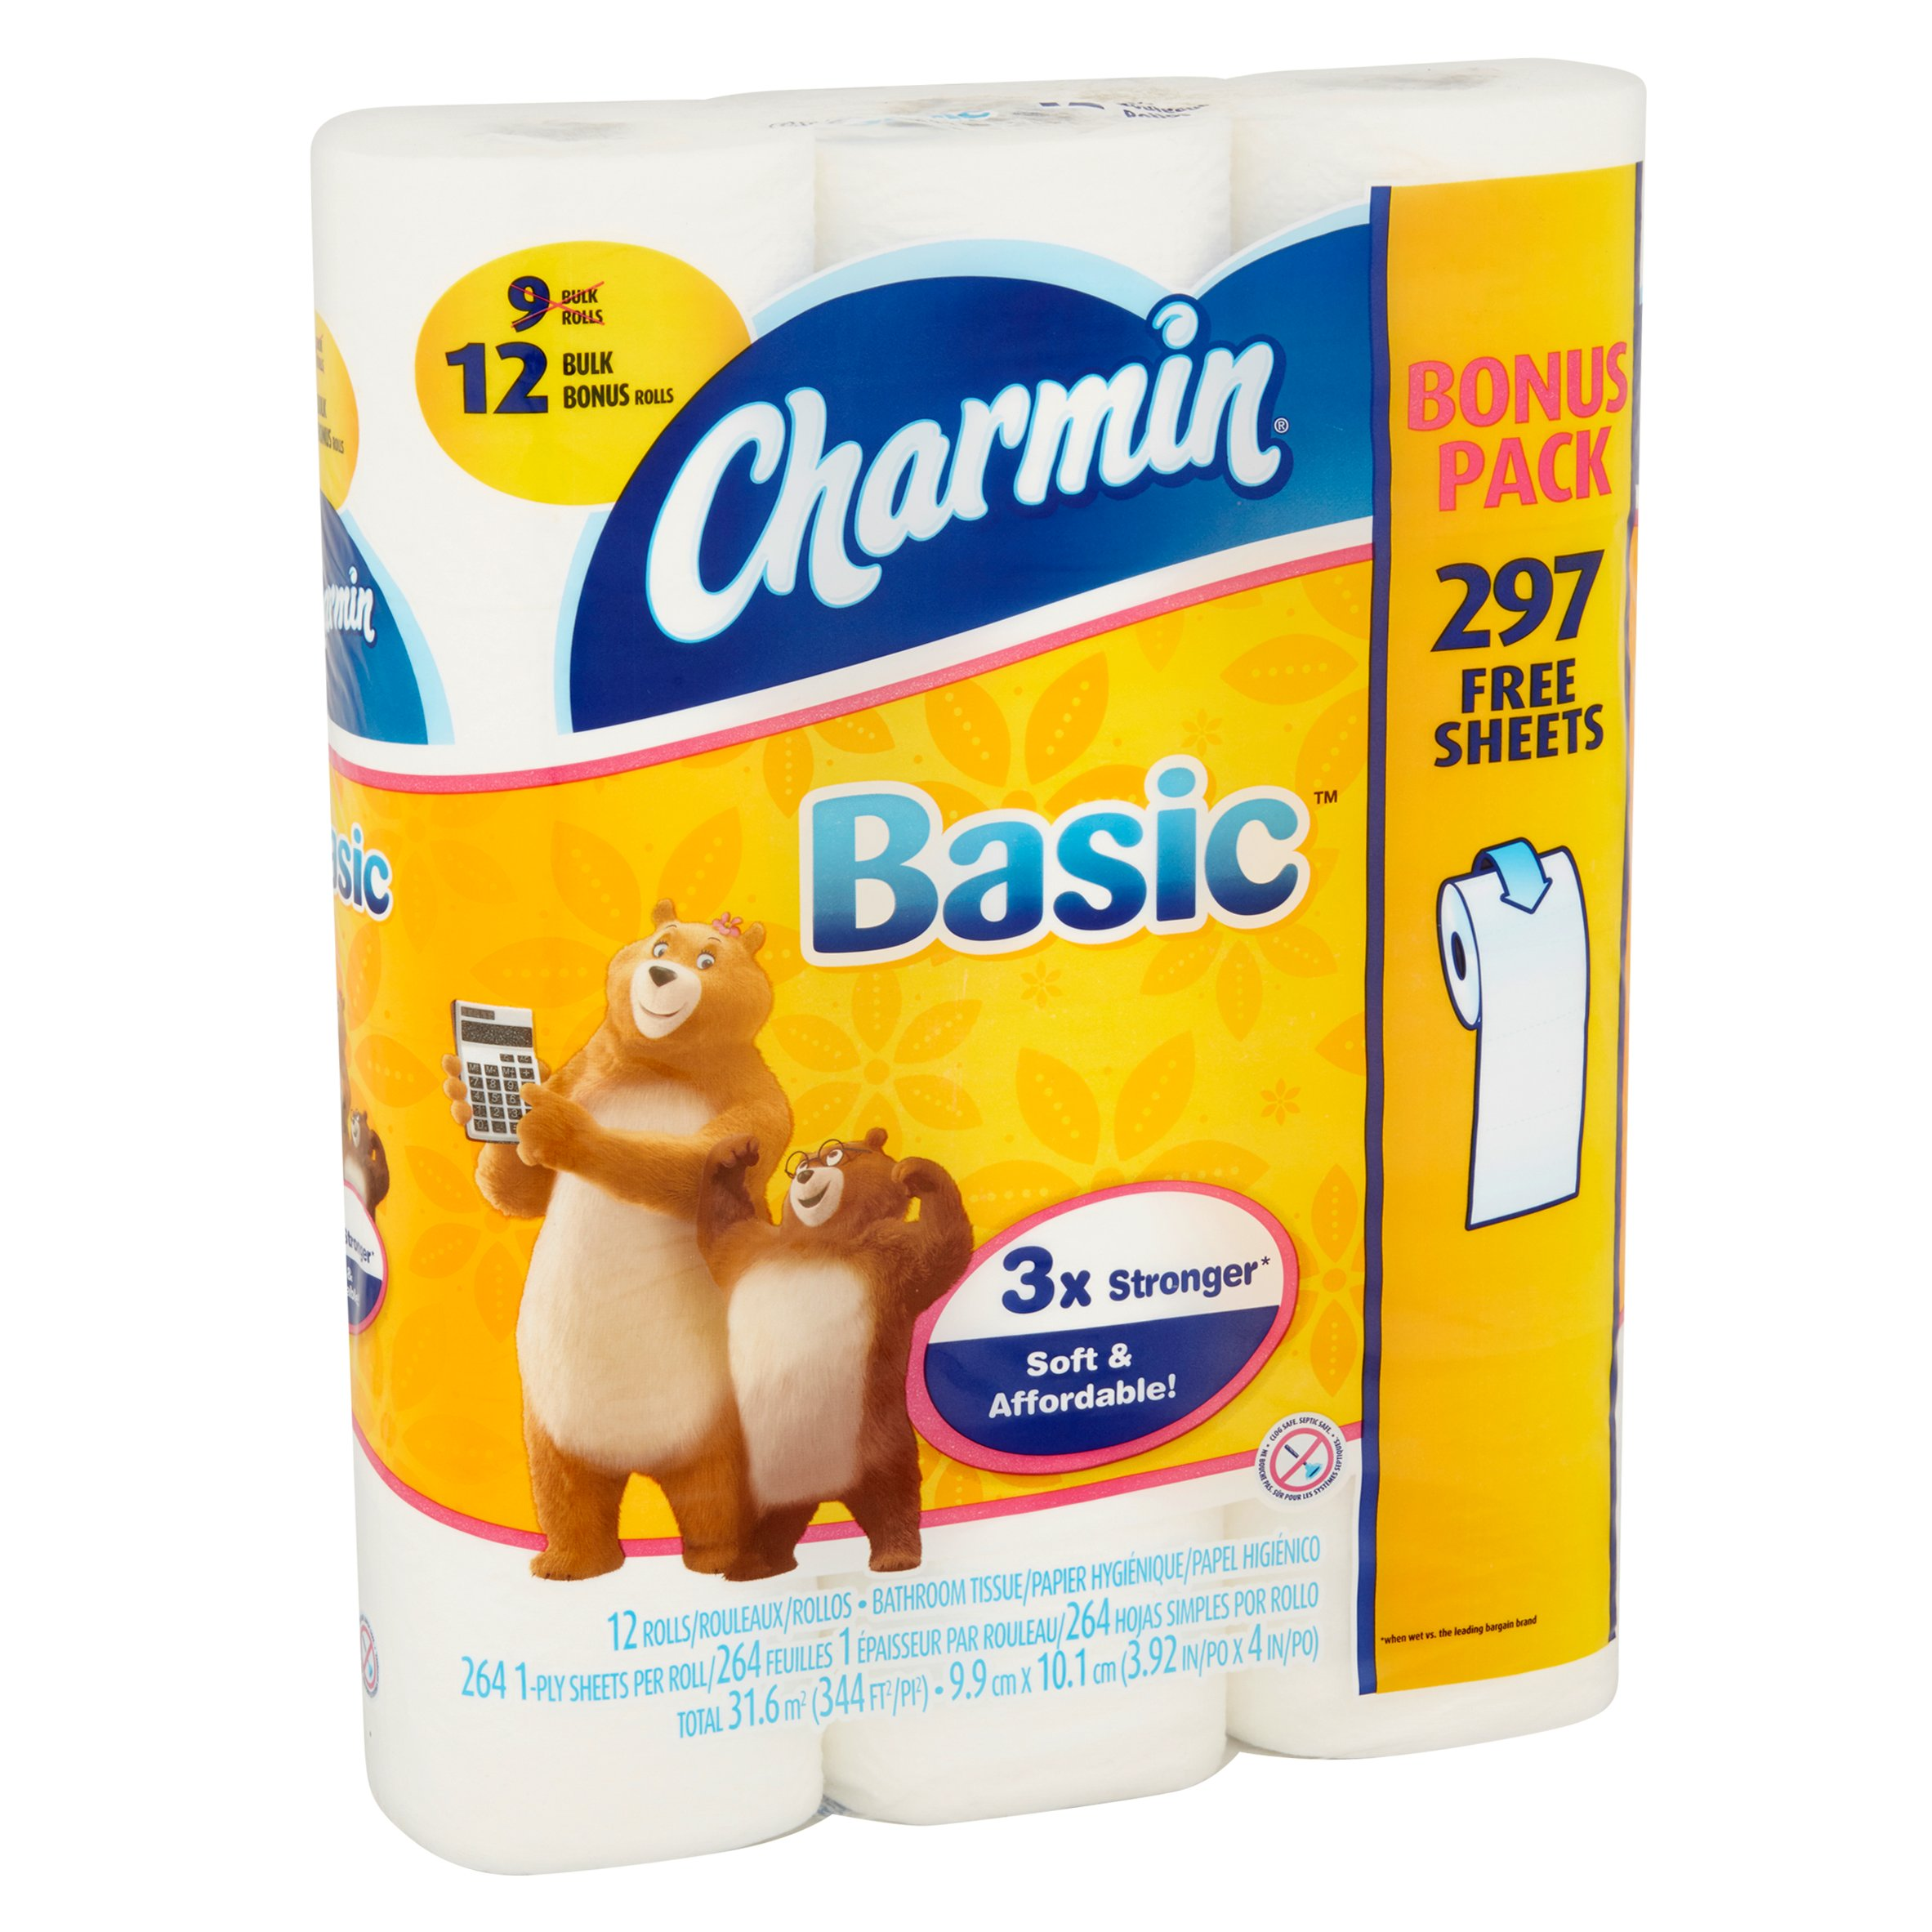 Charmin Basic Bathroom Tissue Rolls, 12 count - Walmart.com